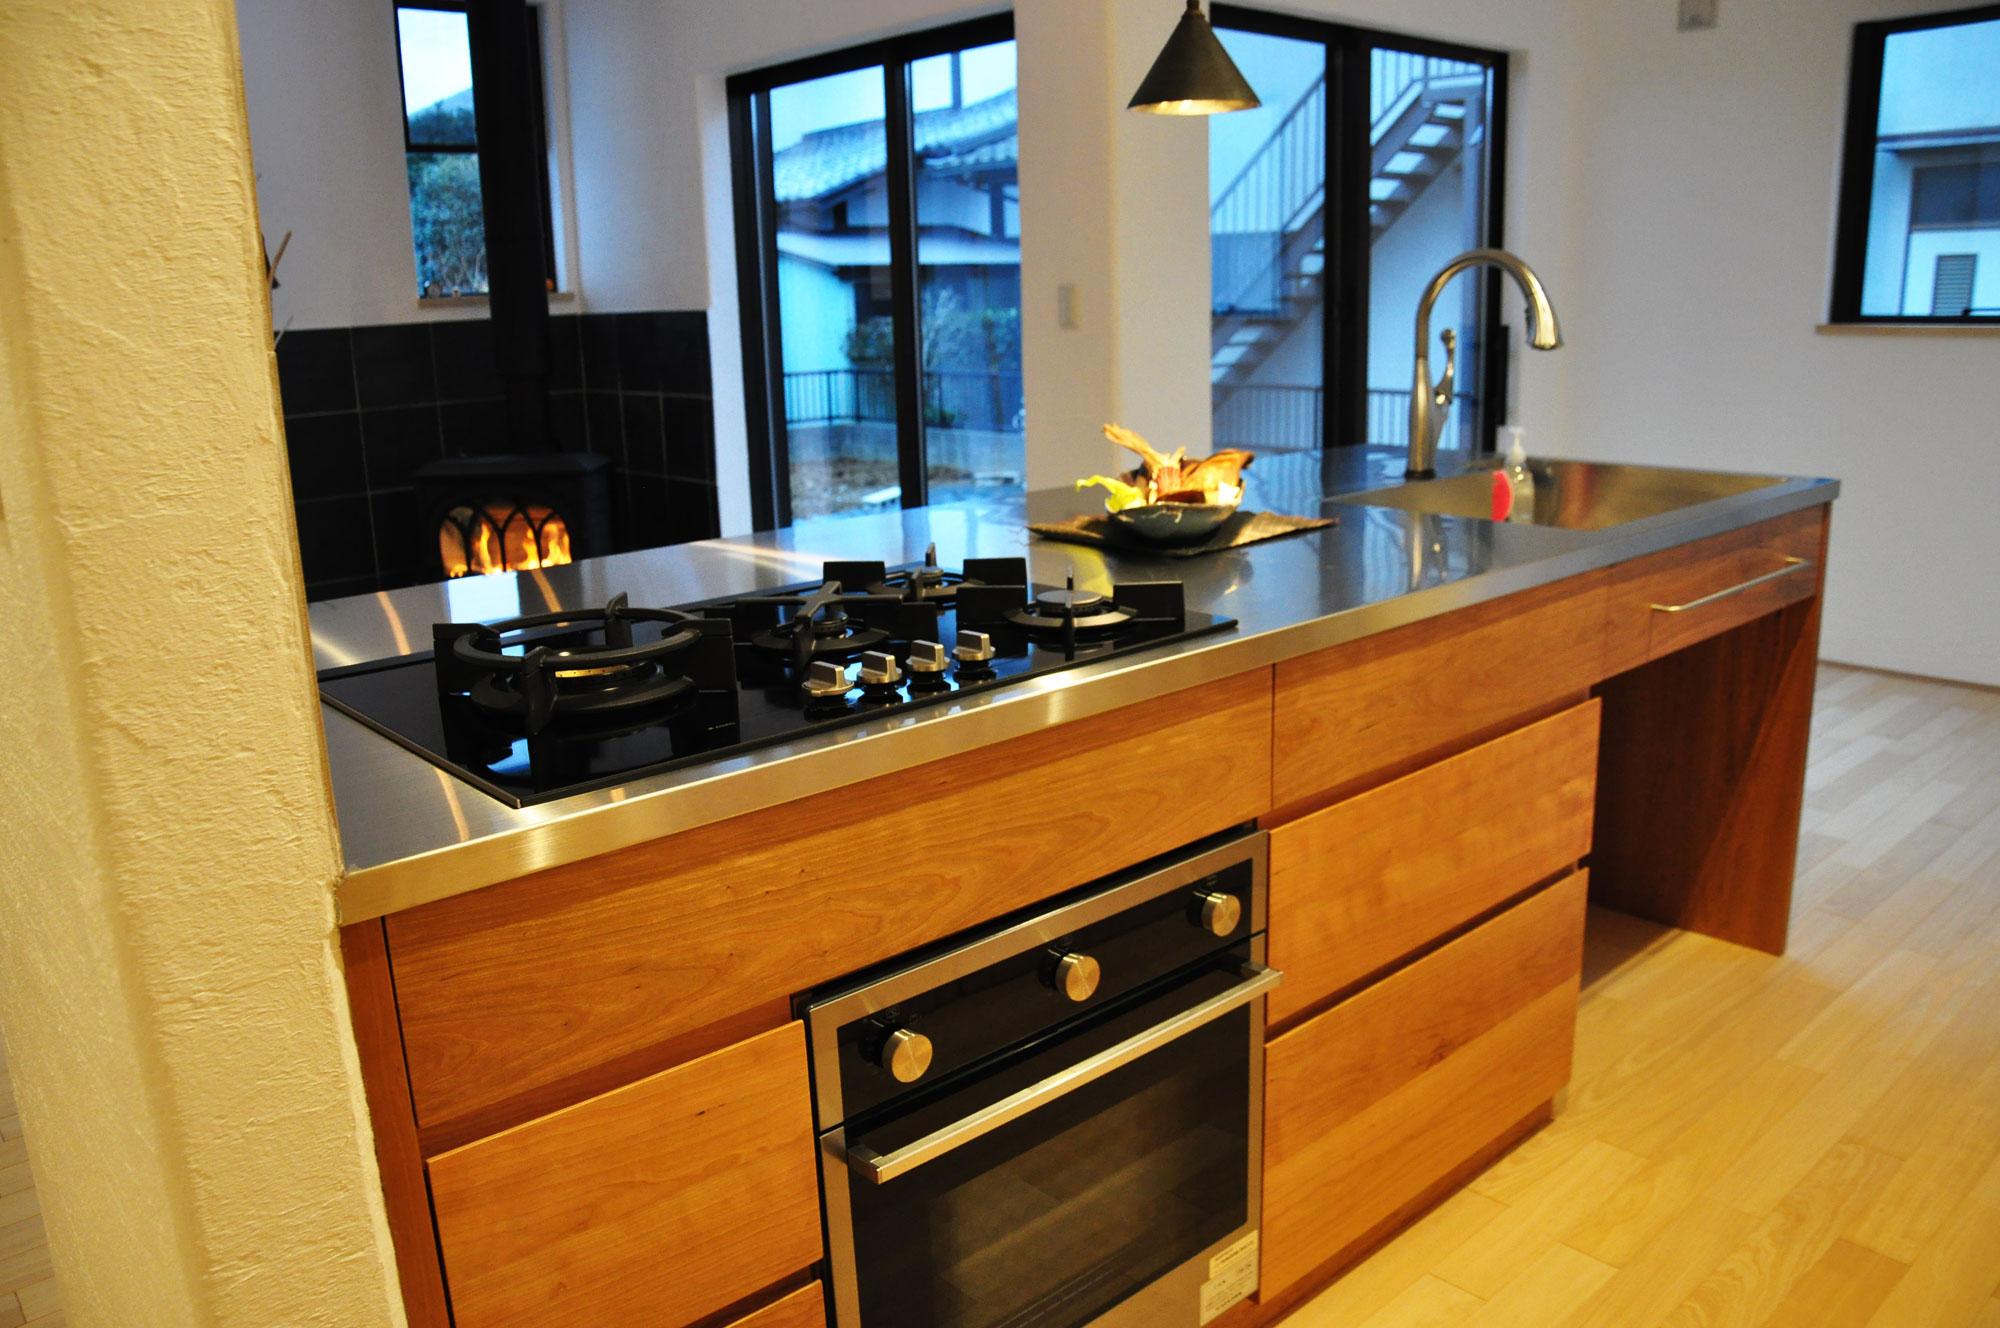 ASKOガスコンロとベルタゾーニのガスオーブンを設置したキッチン no.5056